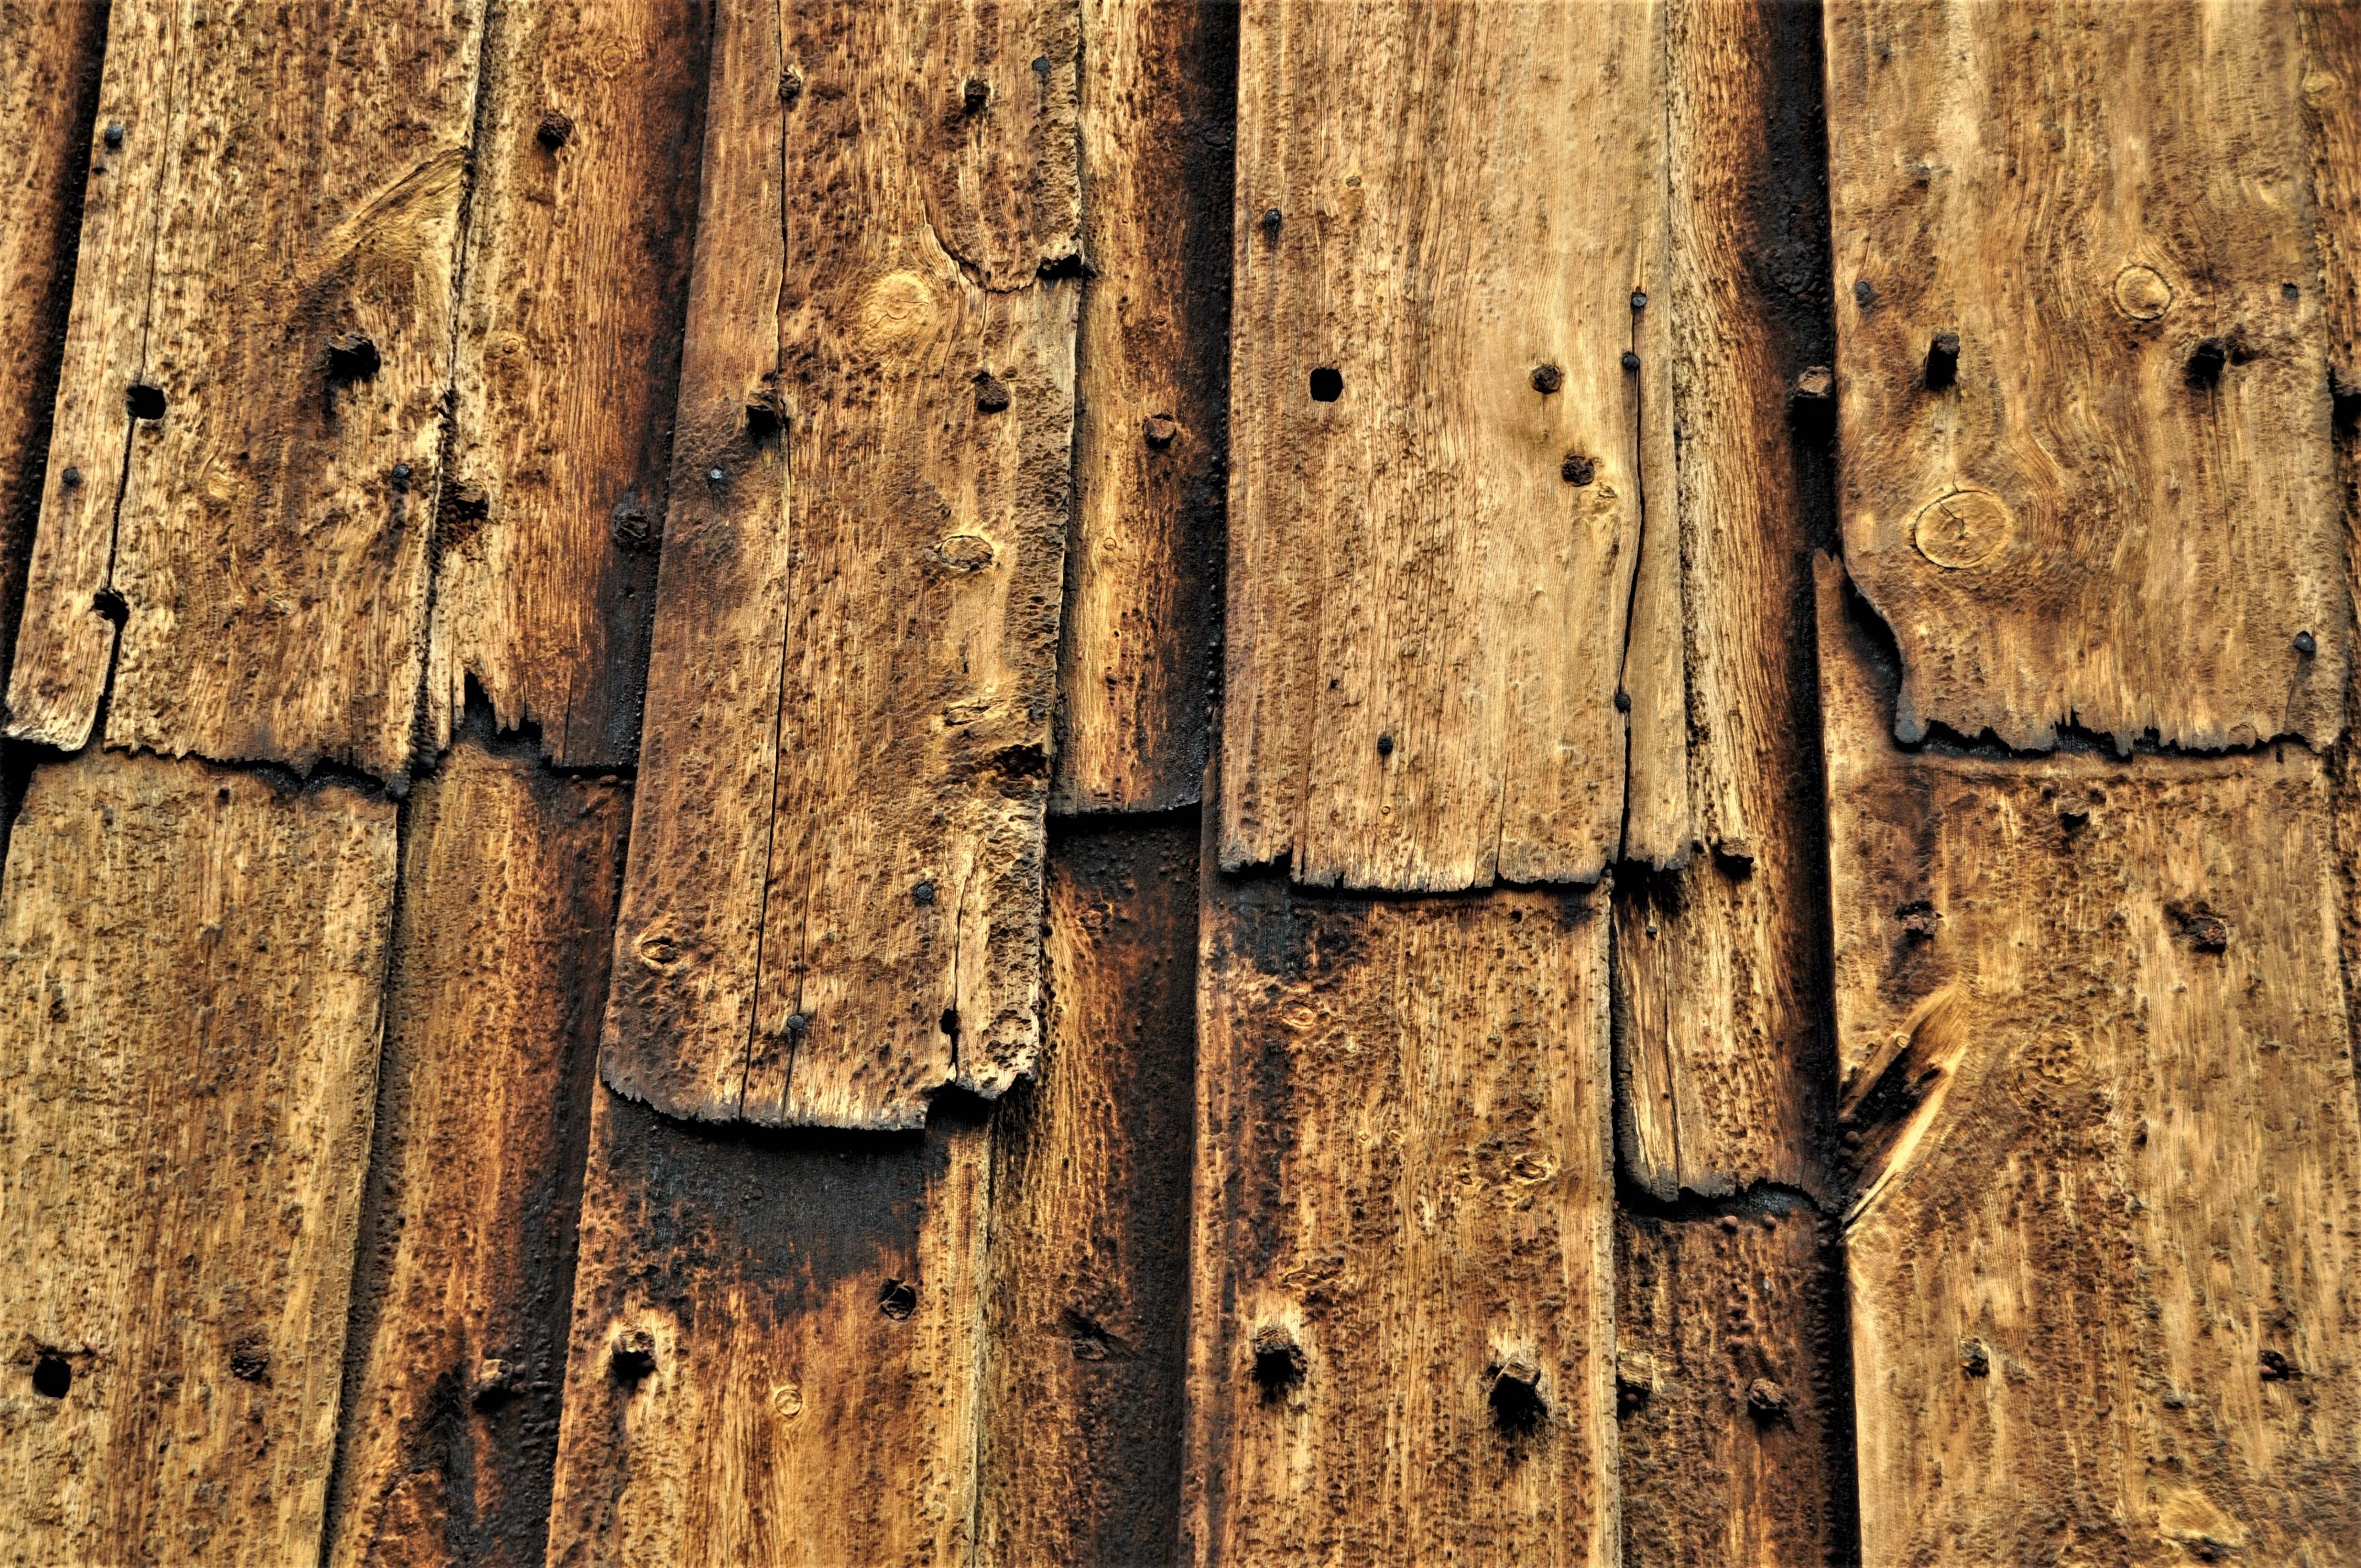 Holz Altern kostenlose foto baum ast textur blatt kofferraum alt boden